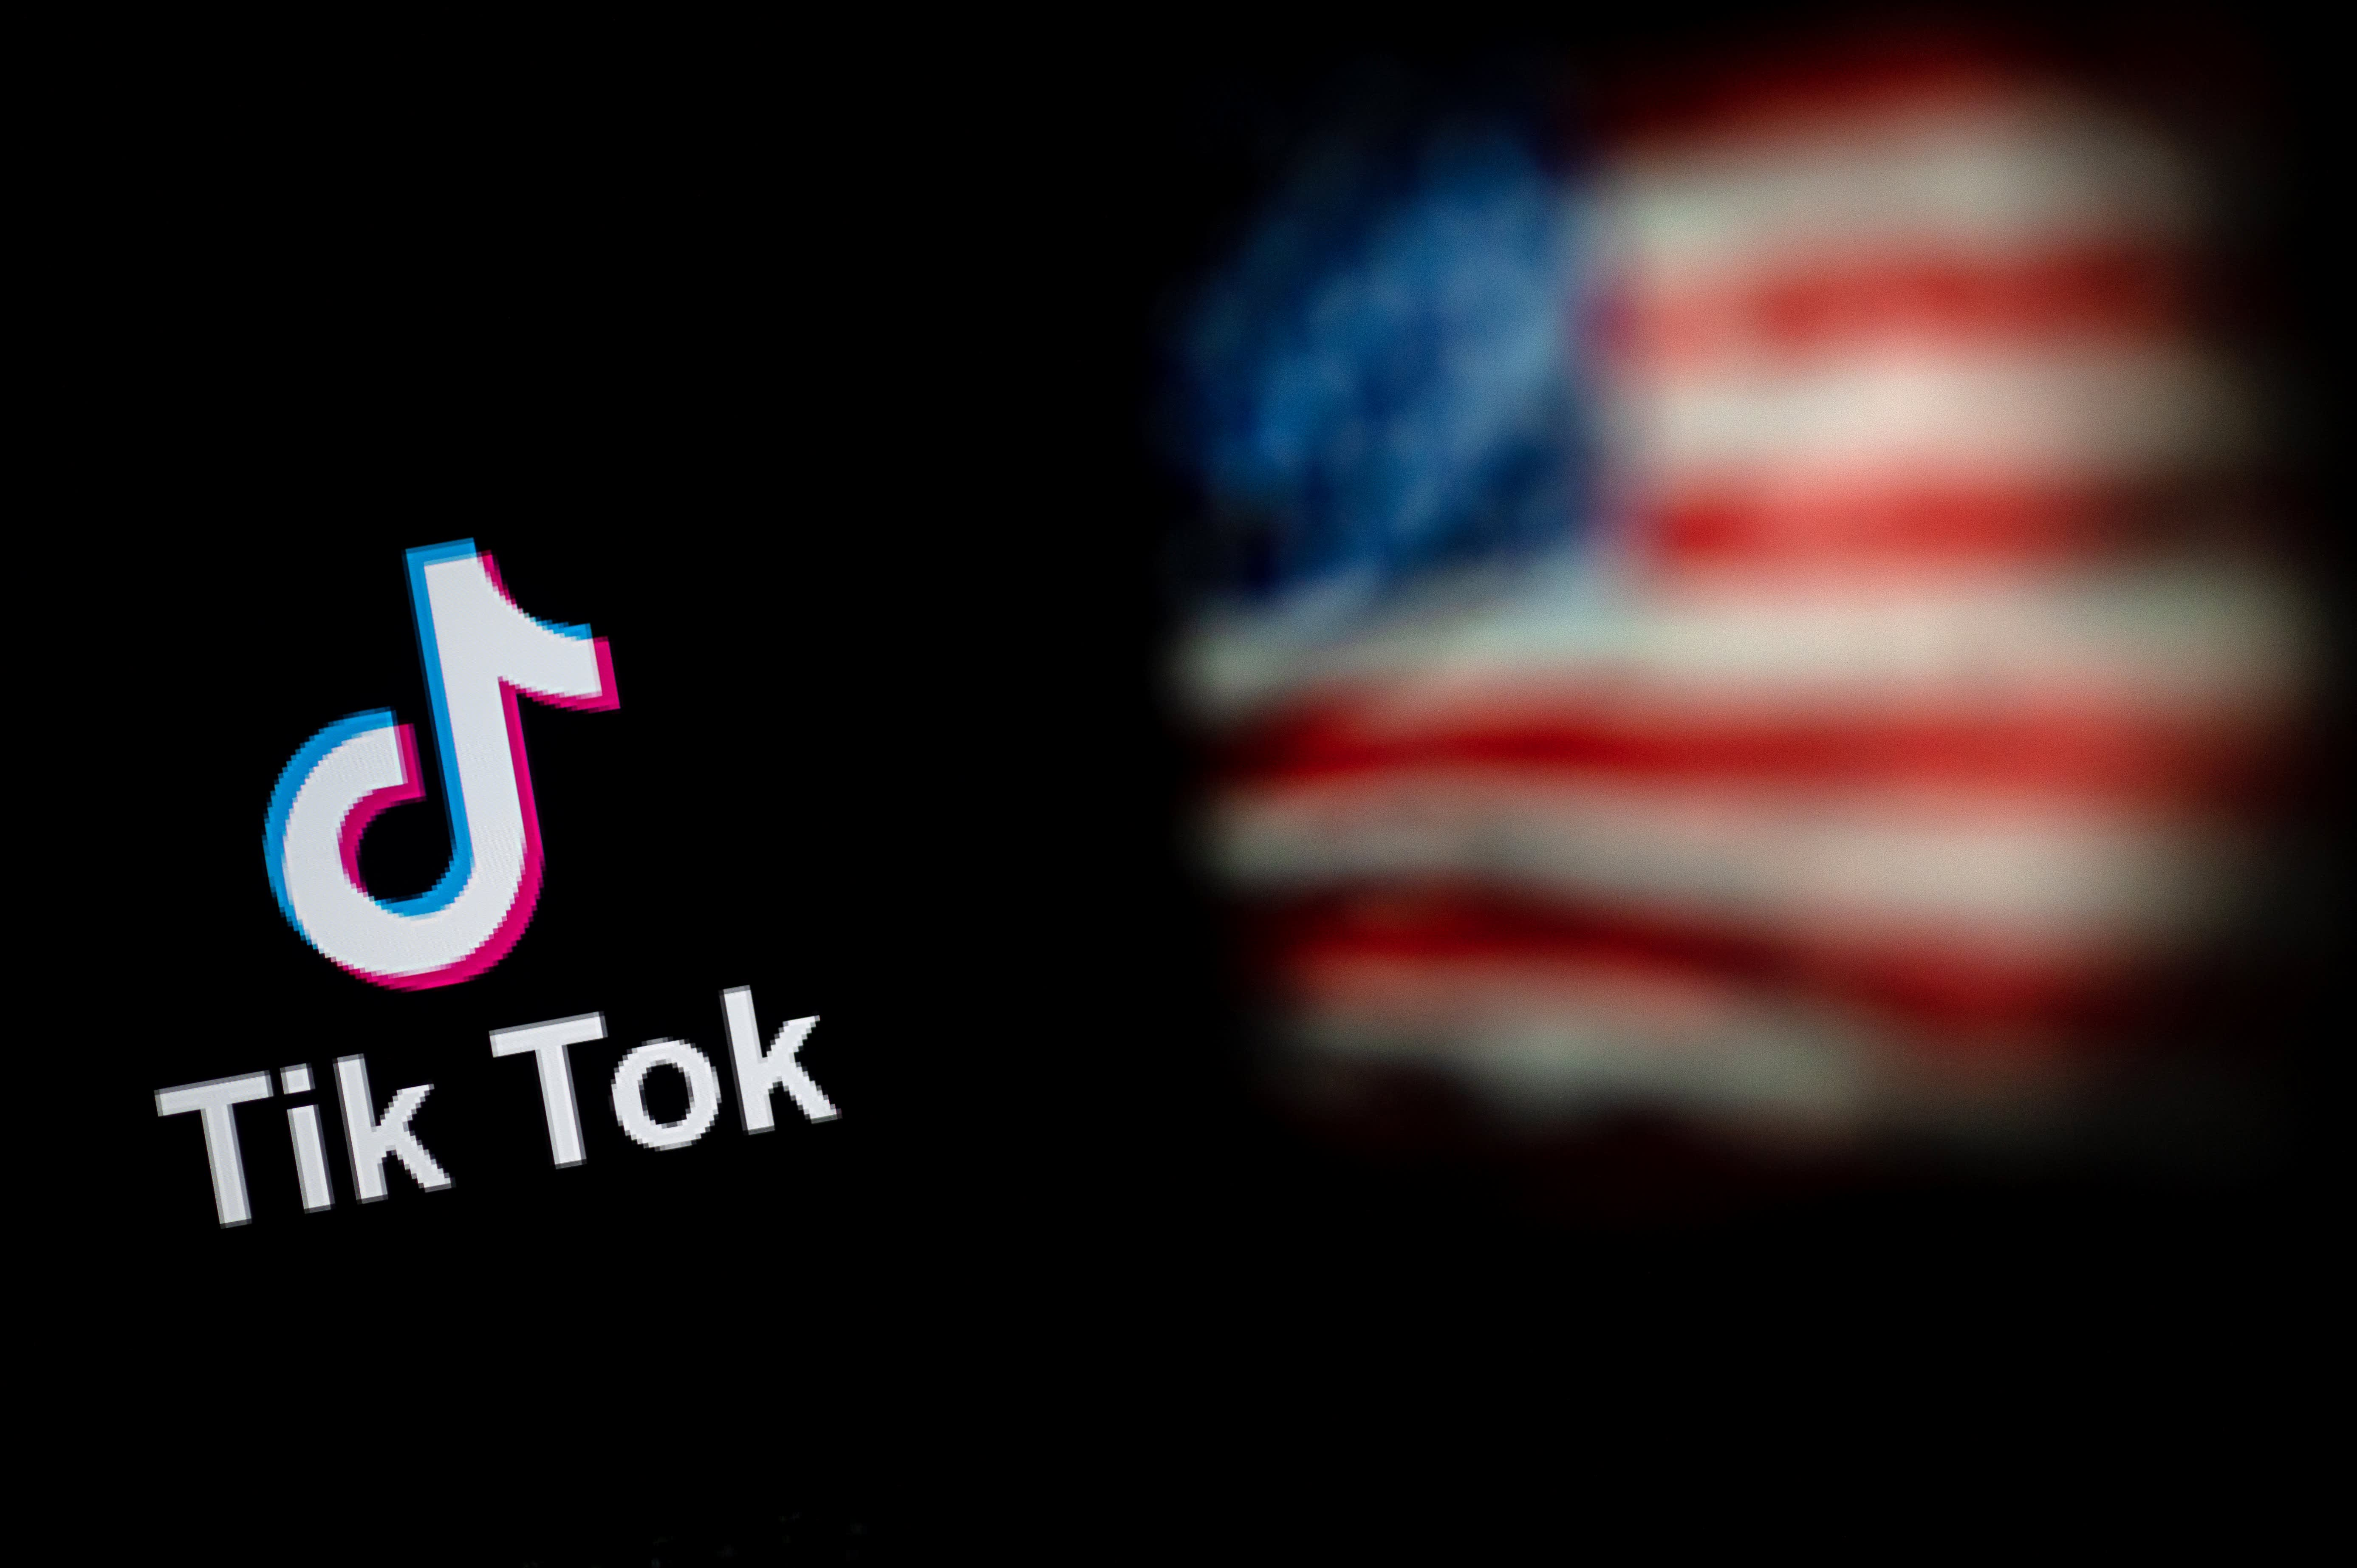 VPN interest surges in U.S. as TikTok, WeChat users panic